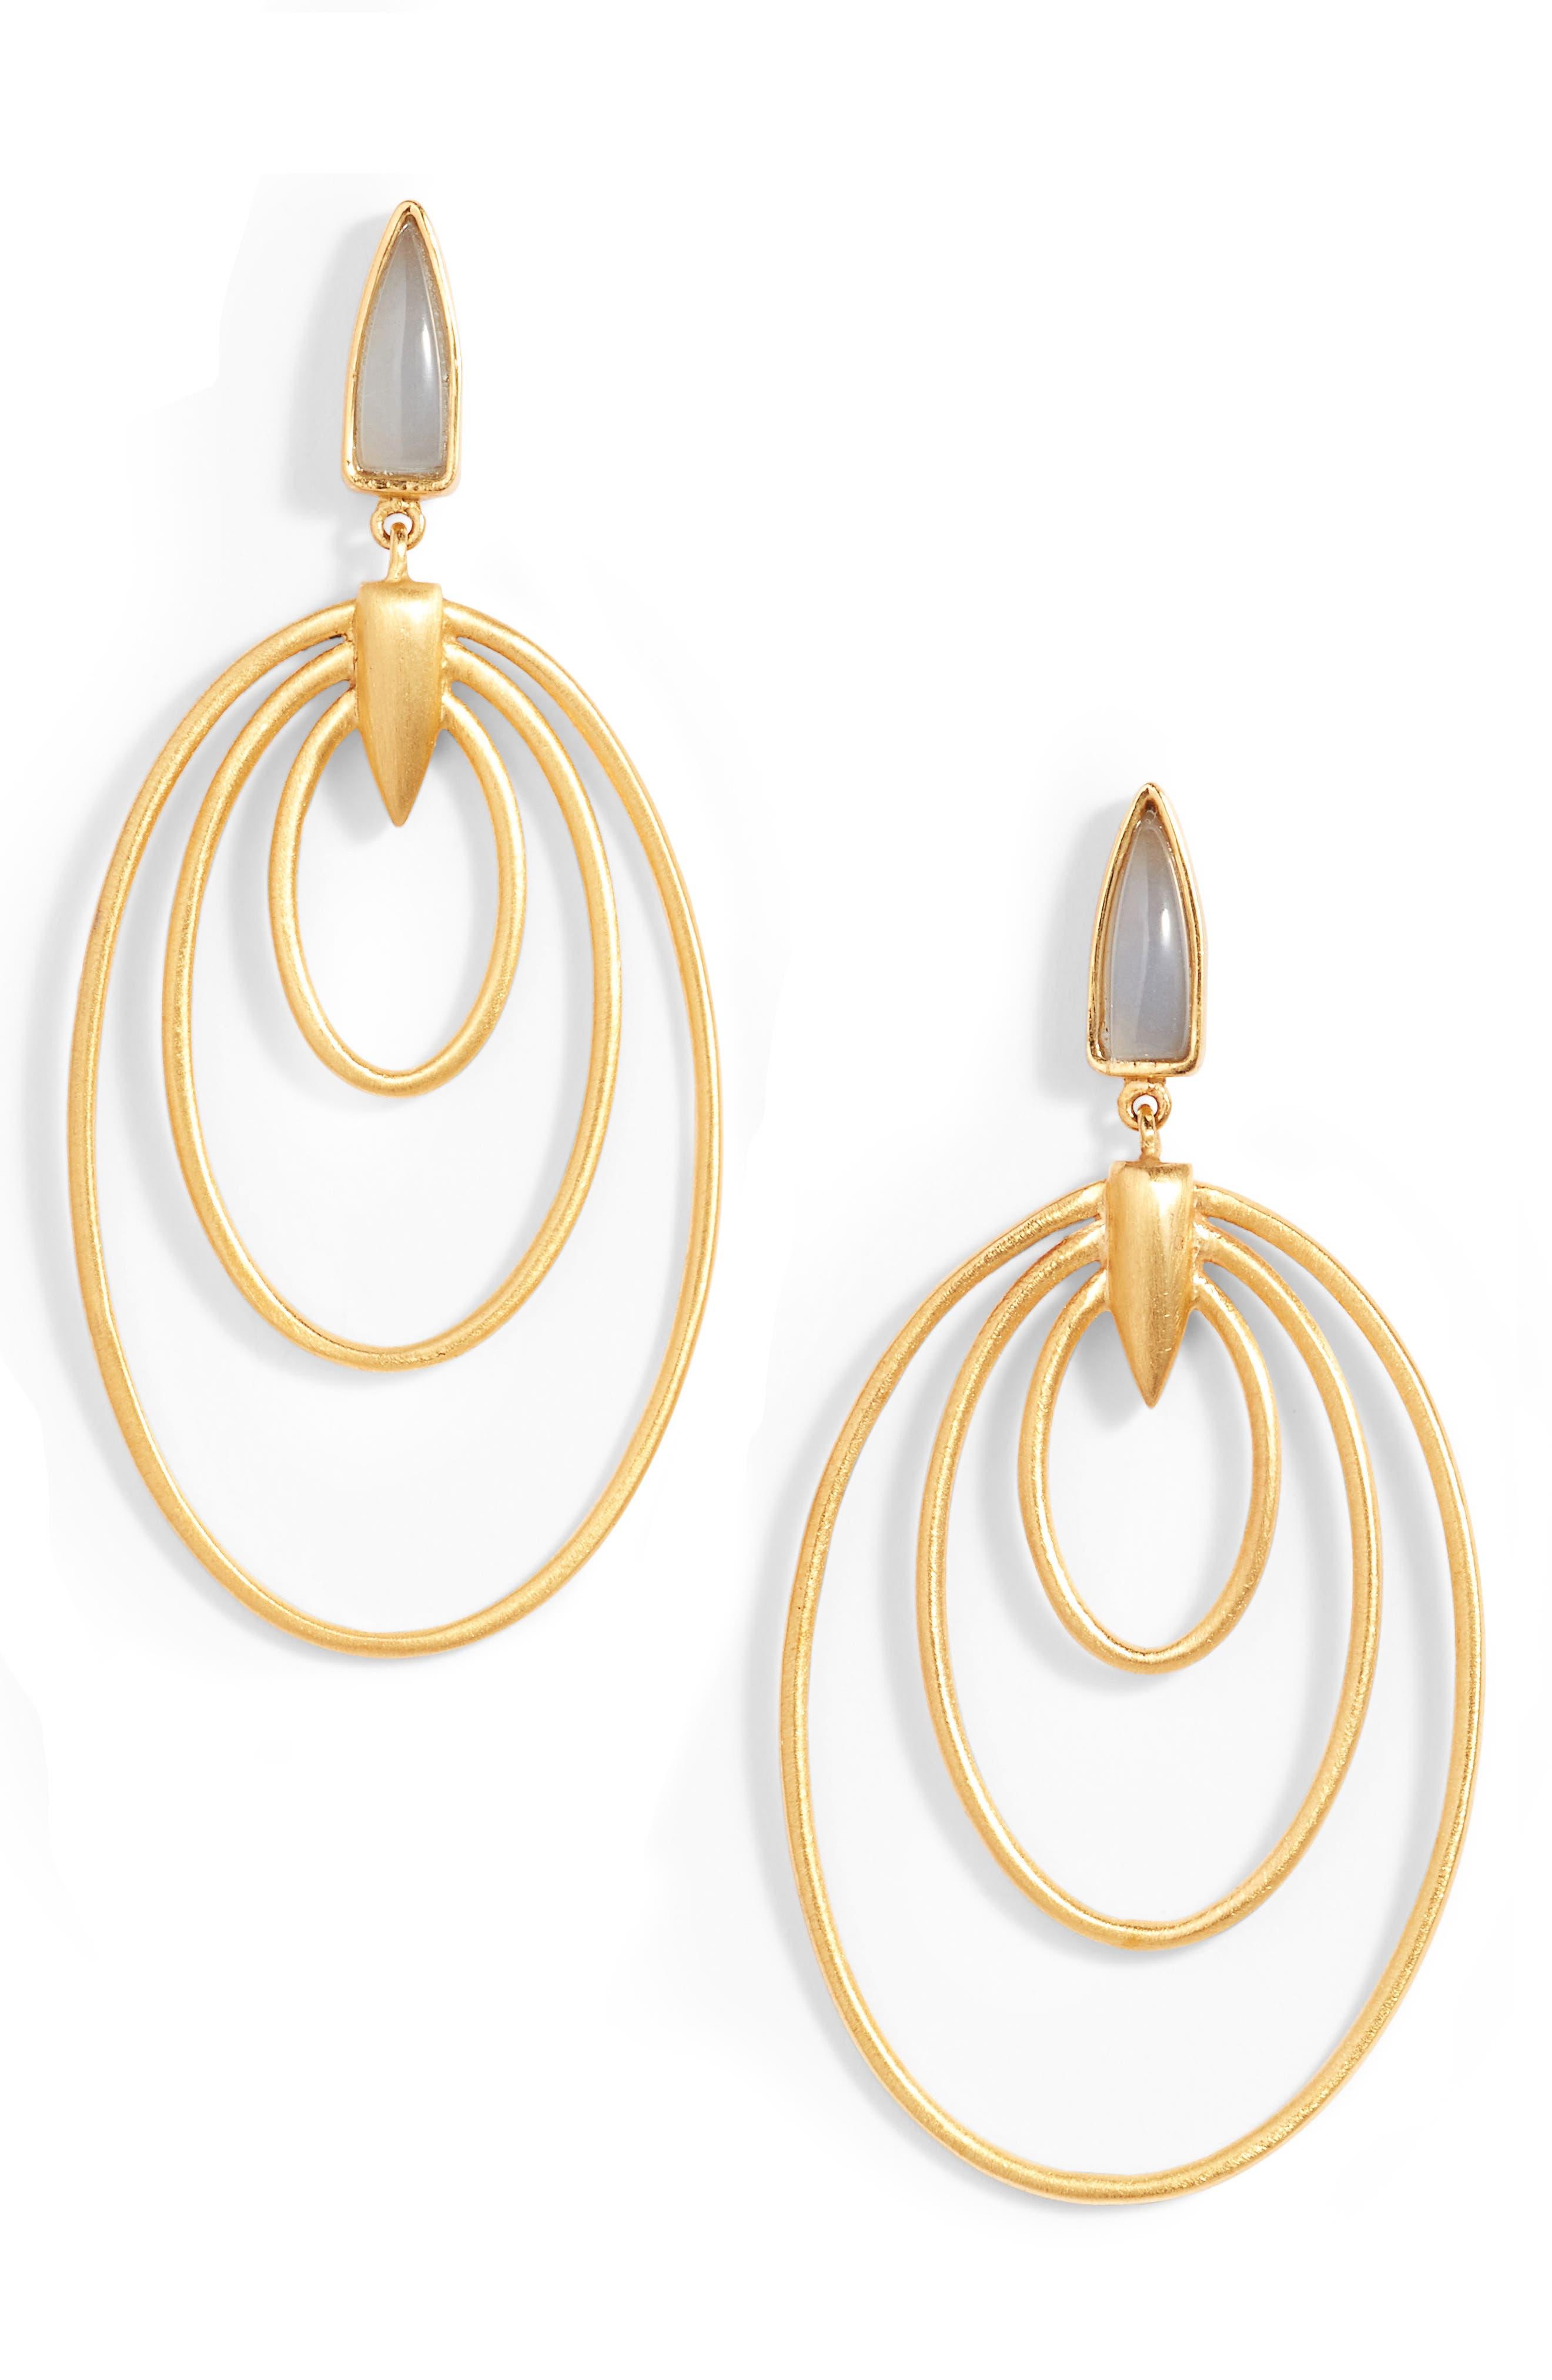 Wave Drop Earrings,                             Main thumbnail 1, color,                             Labradorite/ Gold